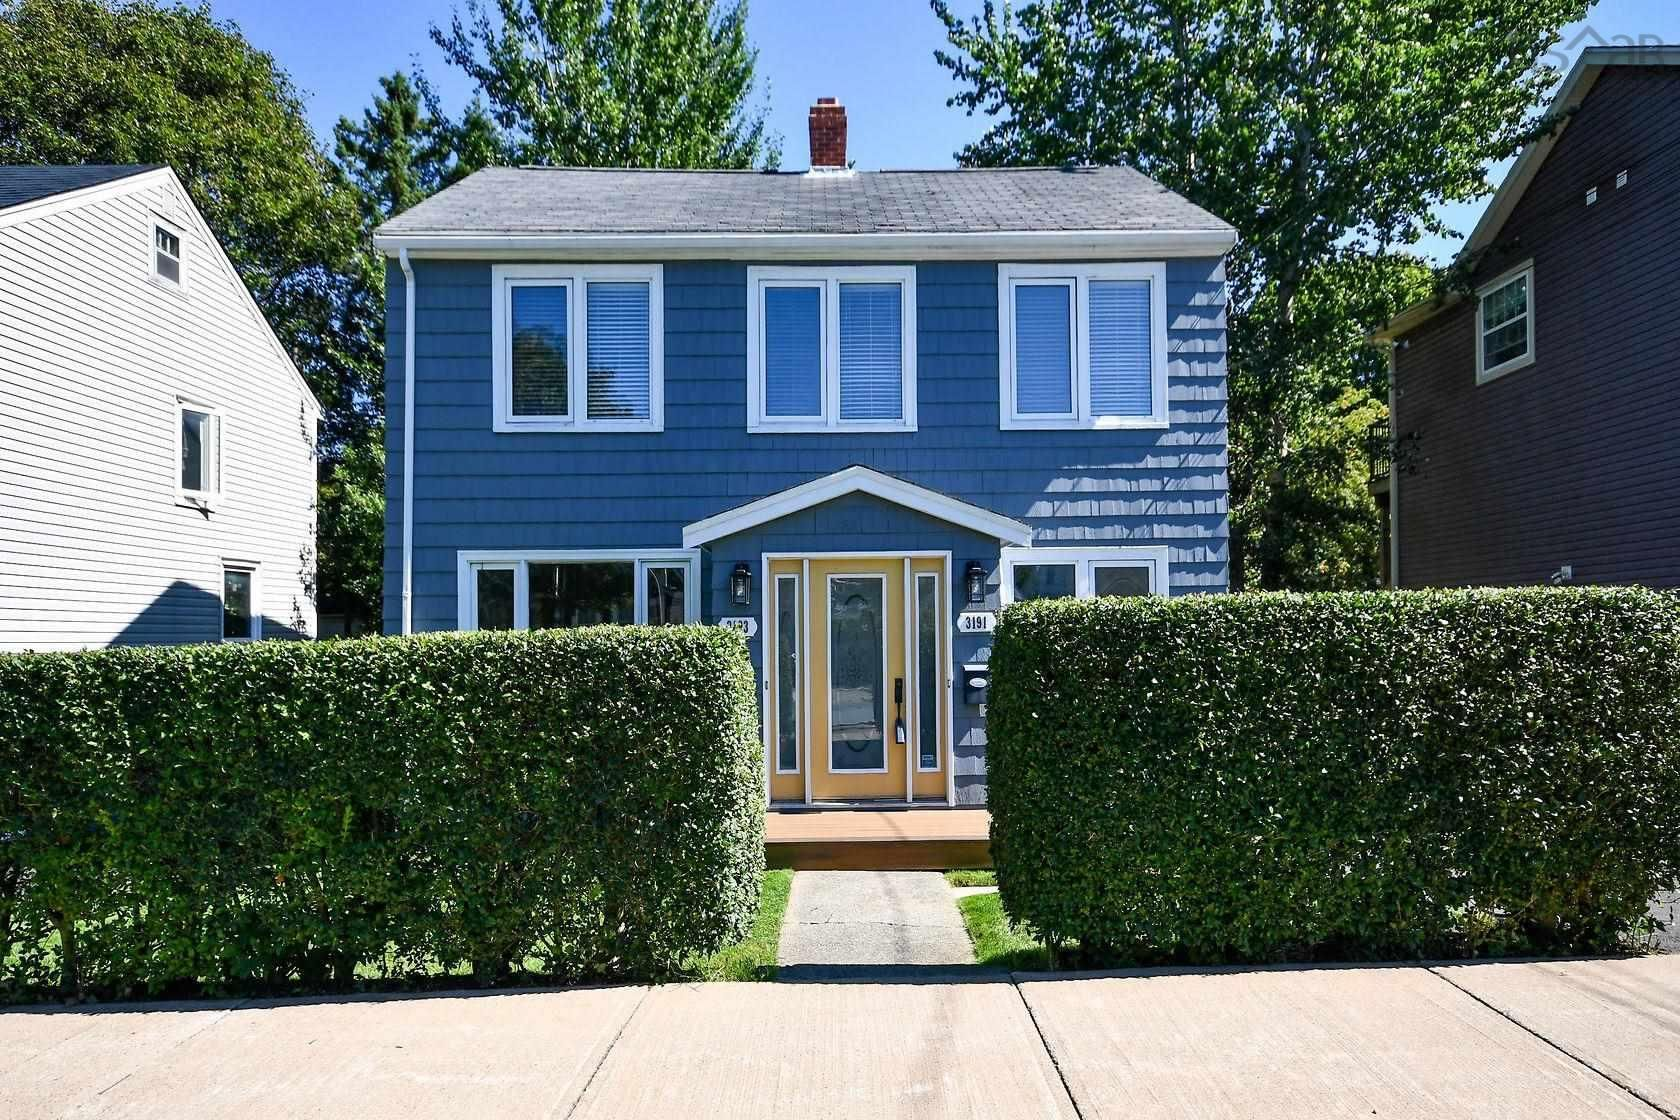 Main Photo: 3191 Ashburn Avenue in Halifax: 4-Halifax West Residential for sale (Halifax-Dartmouth)  : MLS®# 202123641